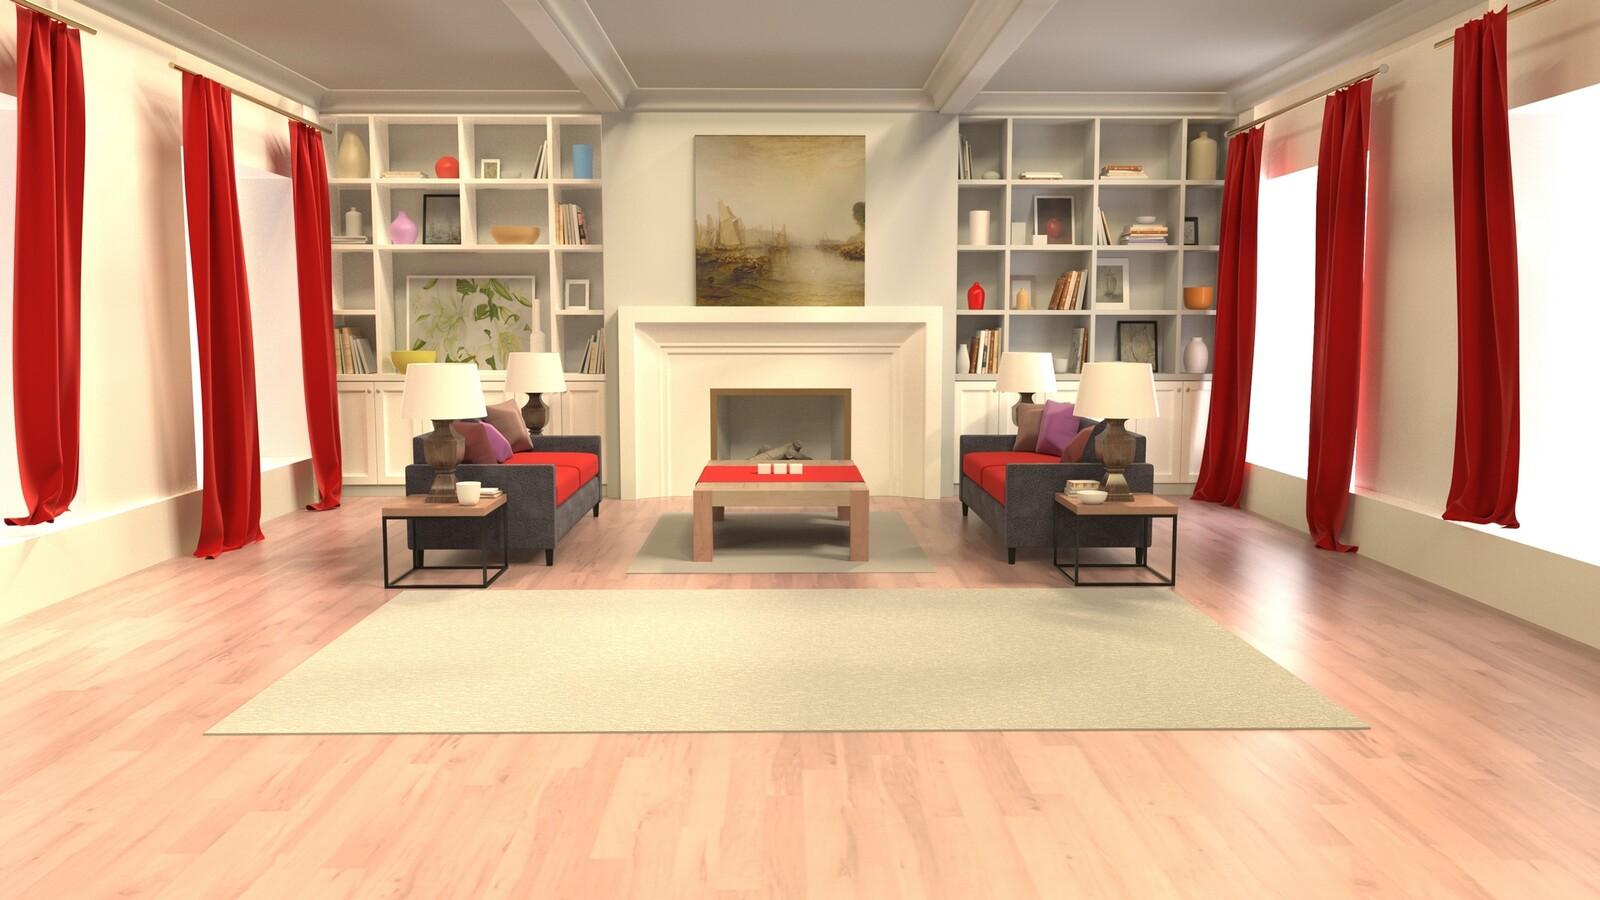 Virtual TV Studio Background - Architectural Rendering/Visualization.